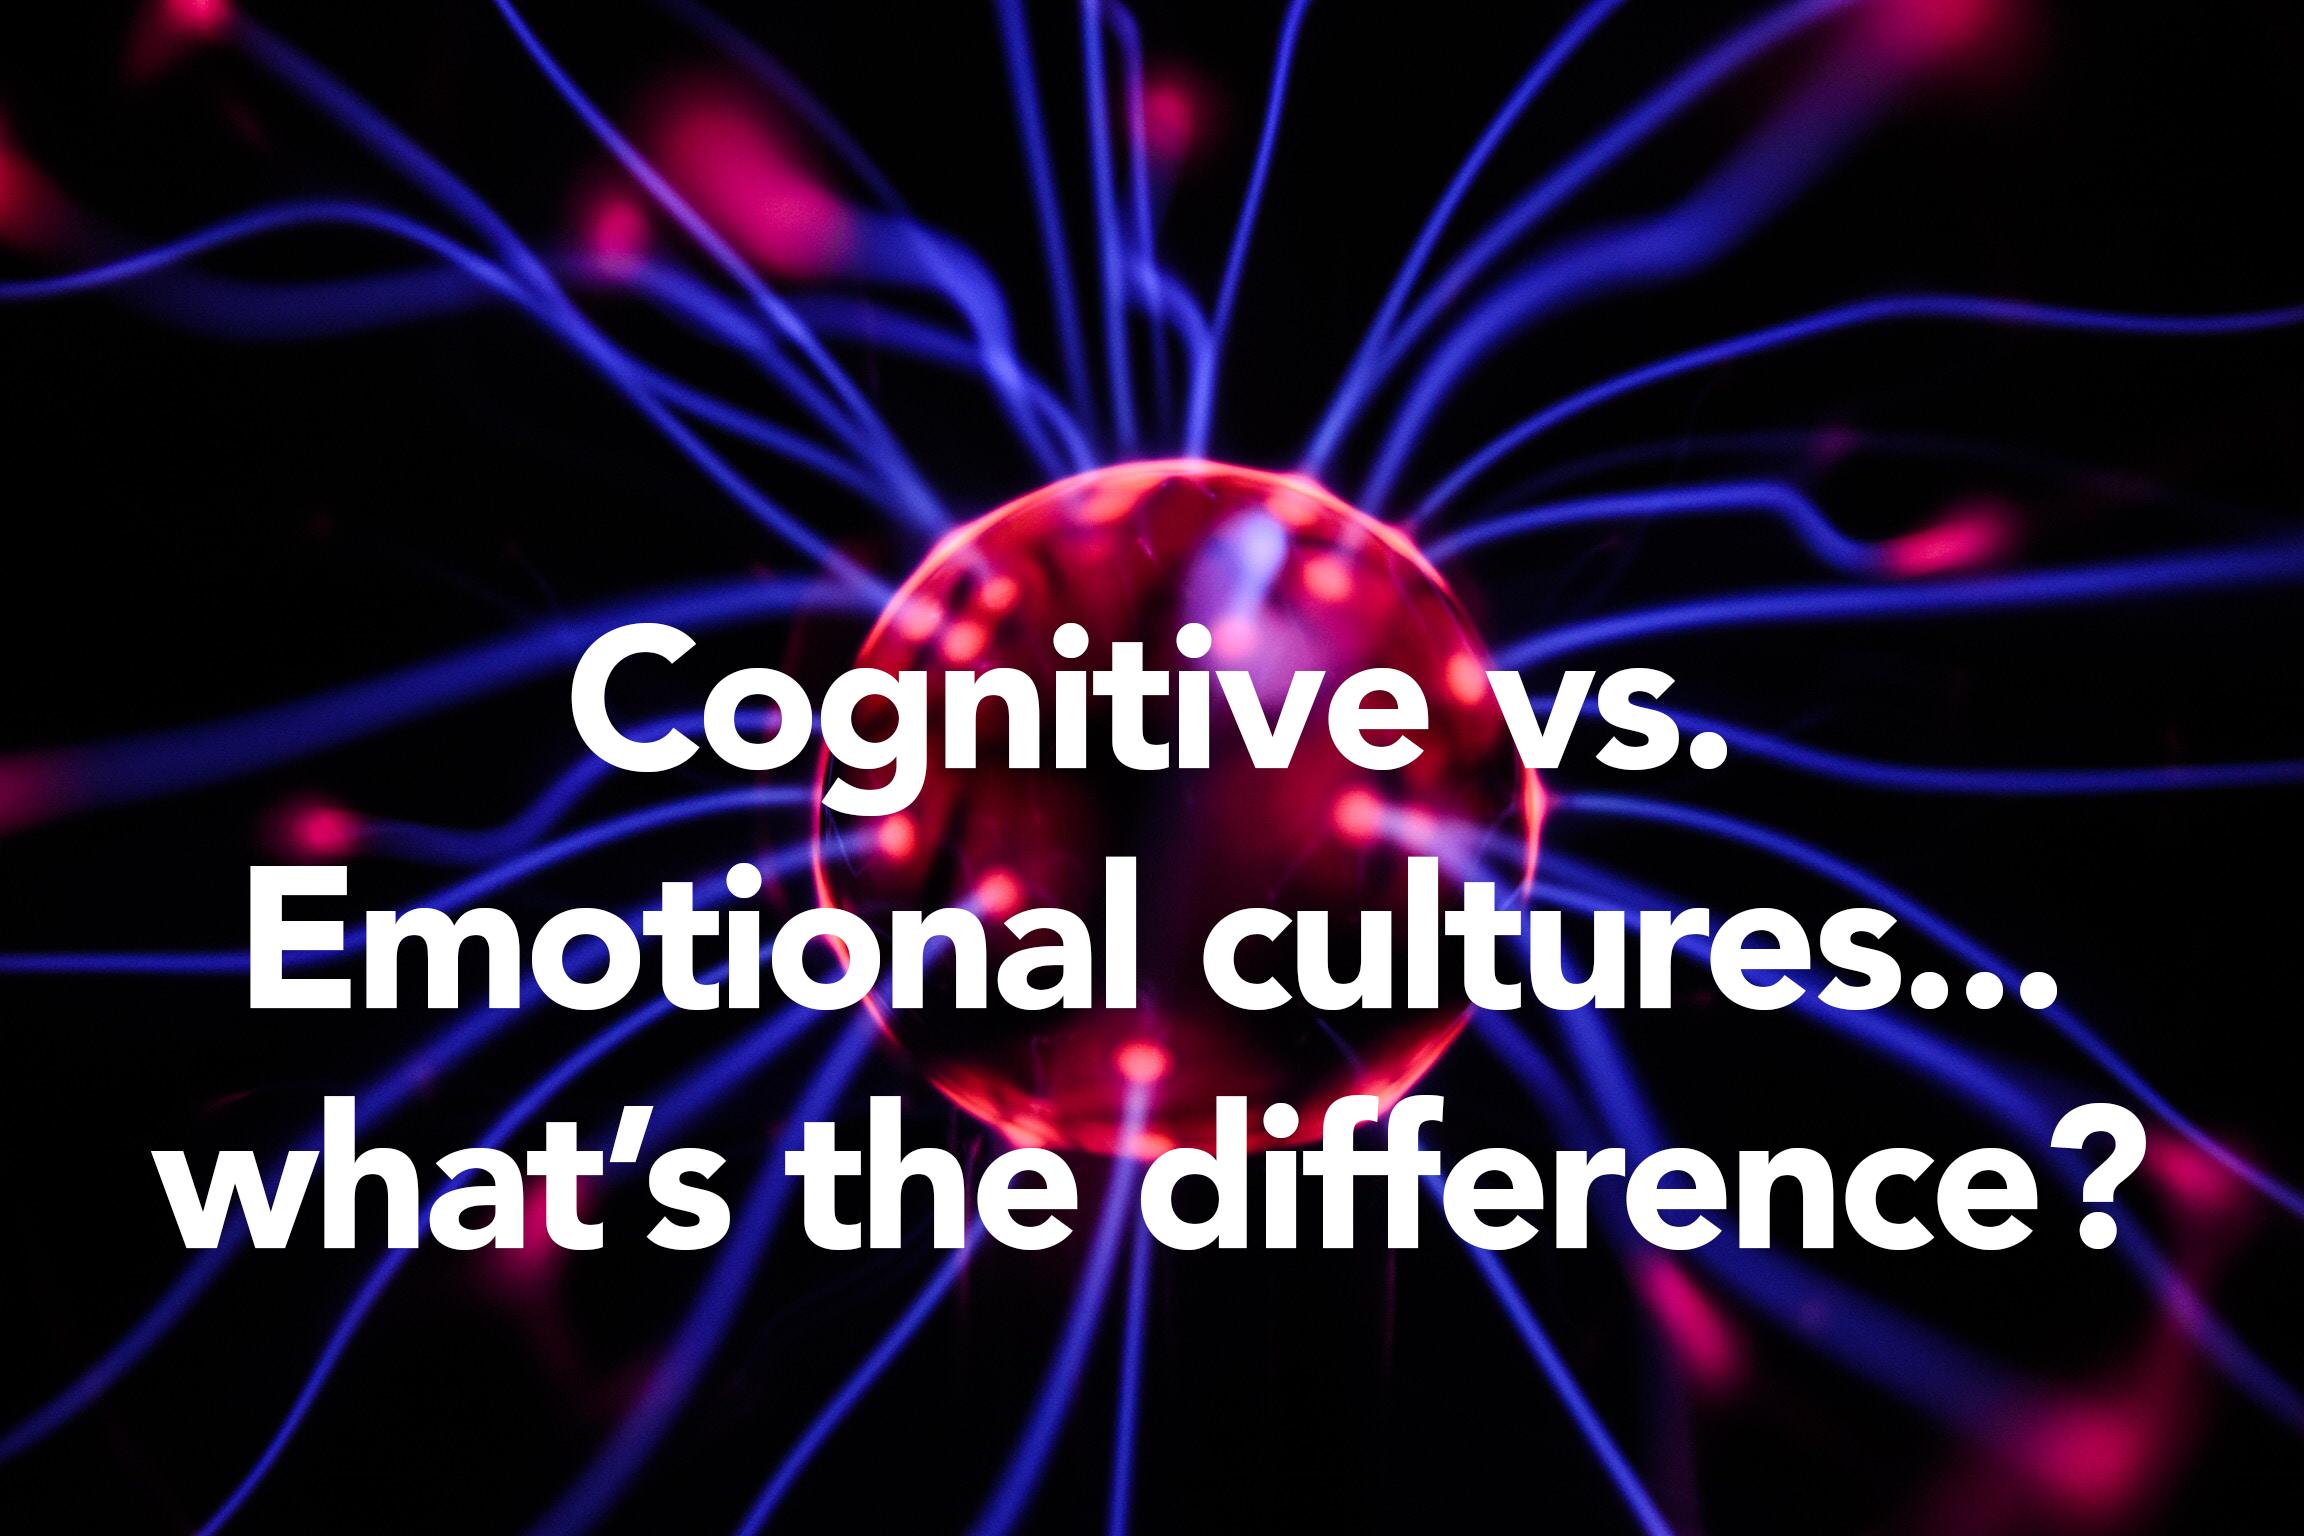 cognitive vs emosh